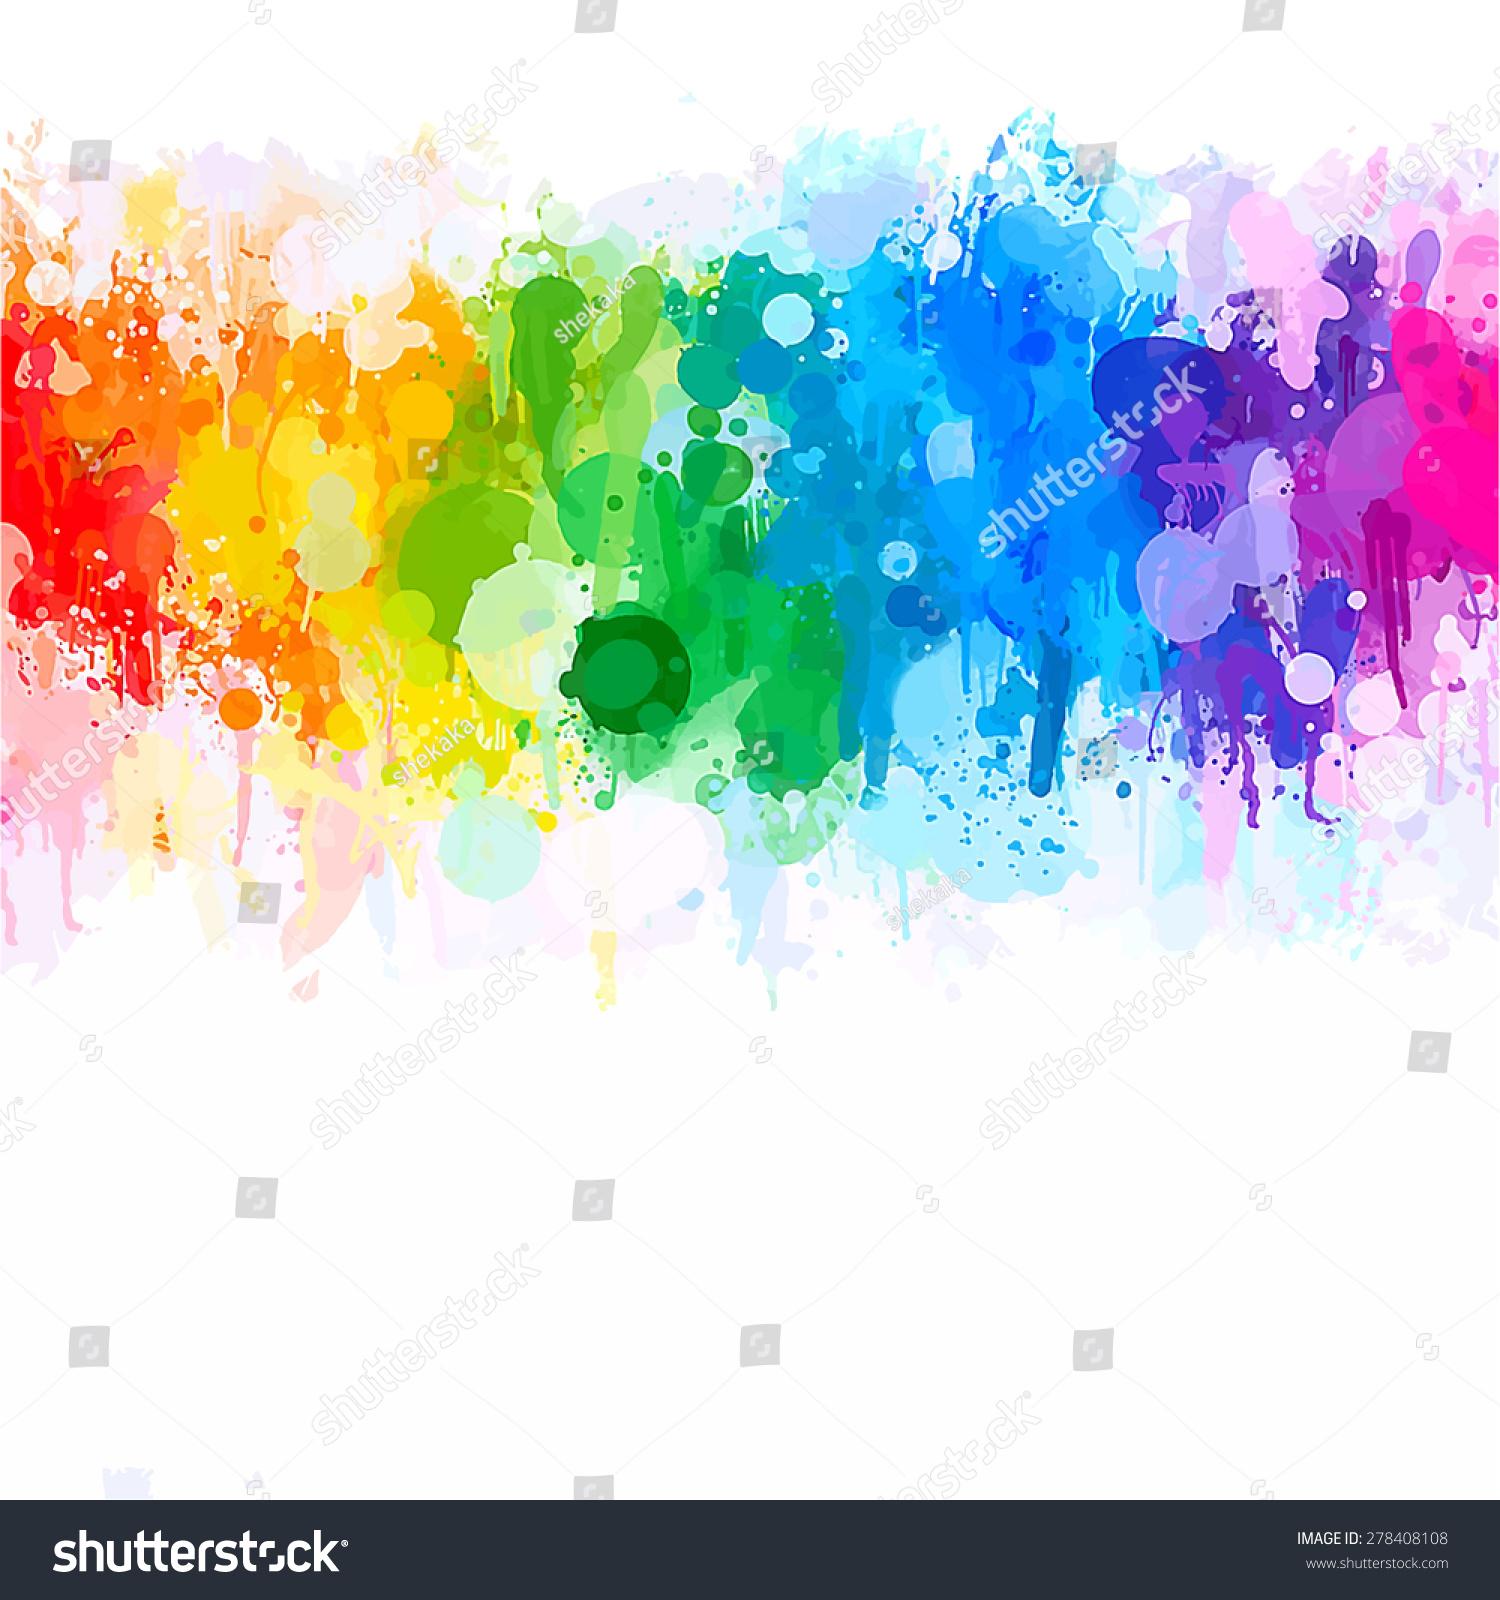 watercolor彩虹brush strokes背景.raster版本